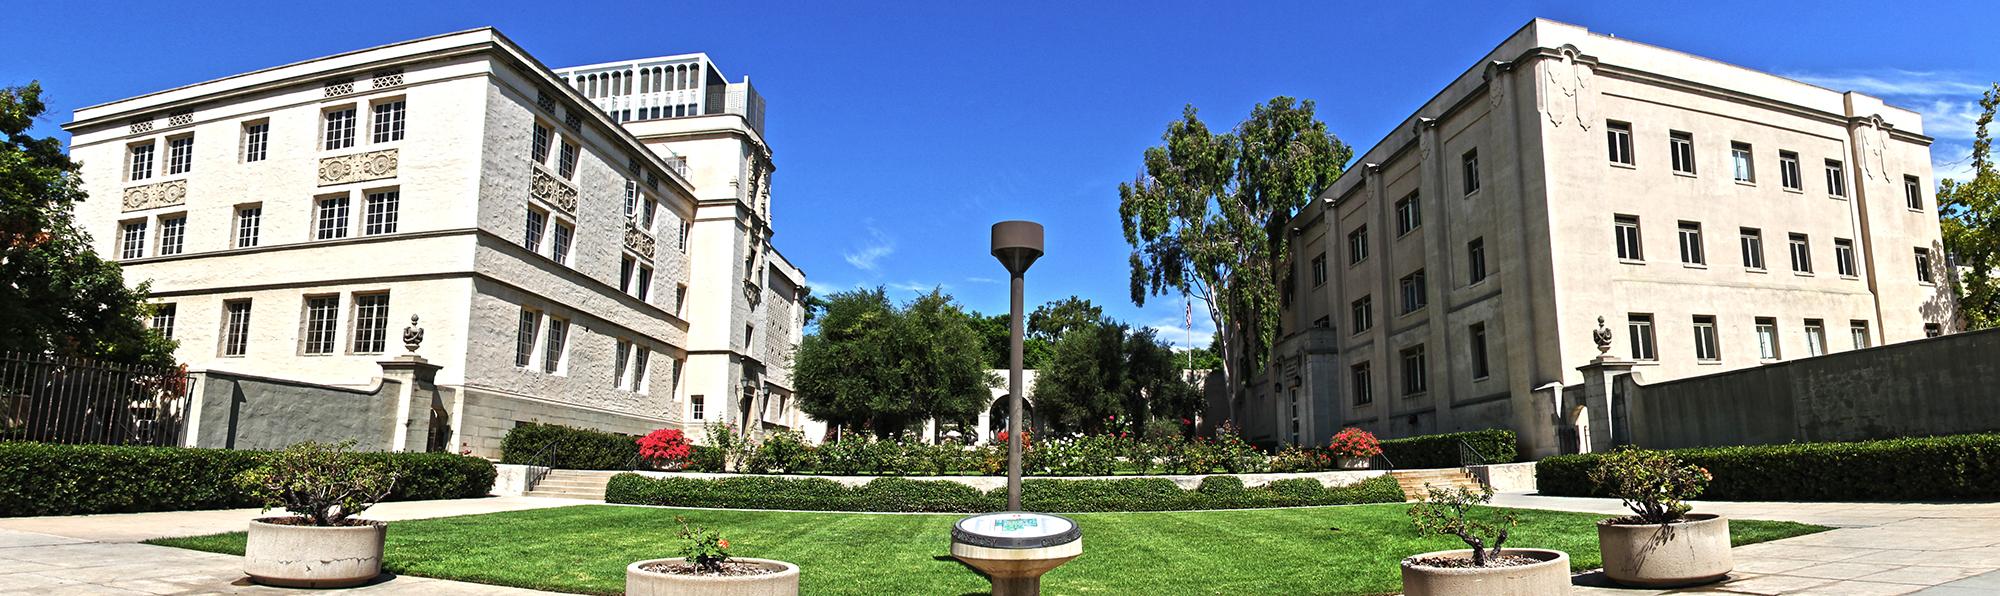 California Institute of Technology. Naľavo vidíme laboratórium fyziky a napravo laboratórium matematiky a fyziky. Zdroj: wiki